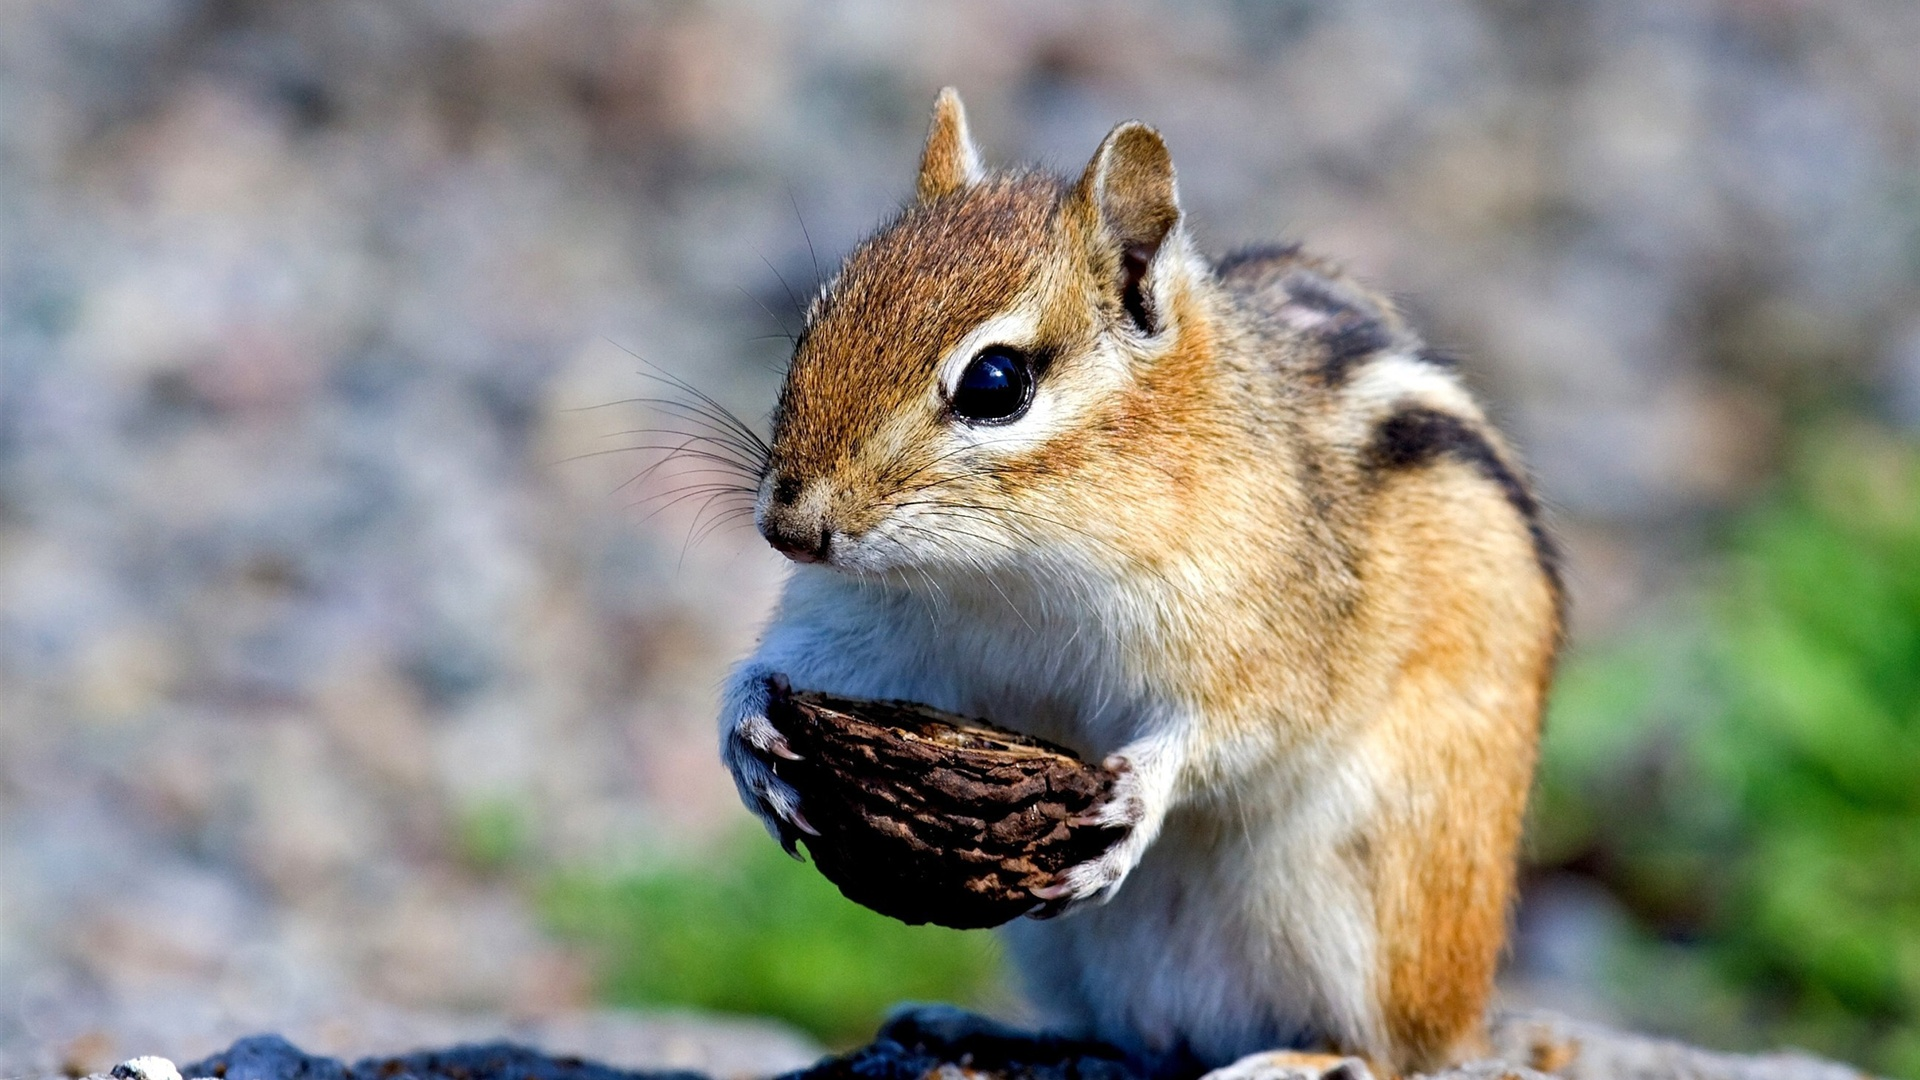 Download Wallpaper 1920x1080 Cute little squirrel Full HD ...